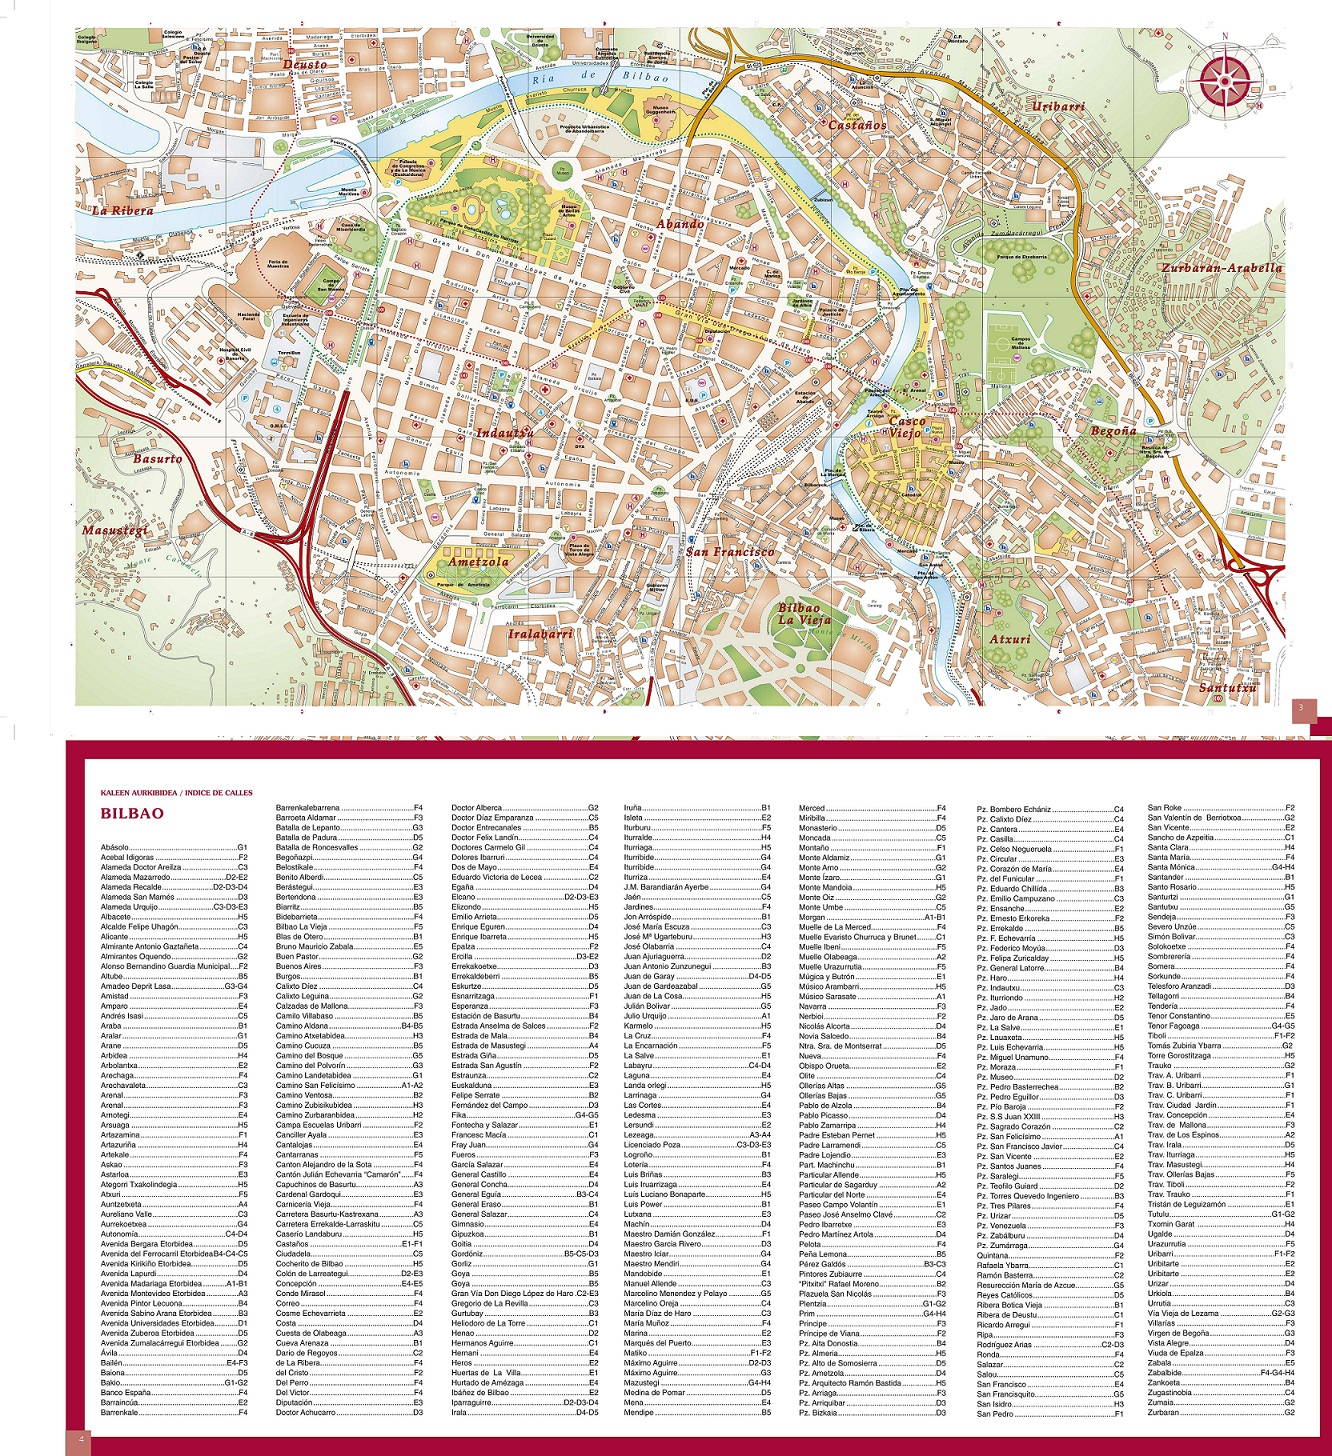 Bilbao Mapa Turistico Callejero Turismovasco Com